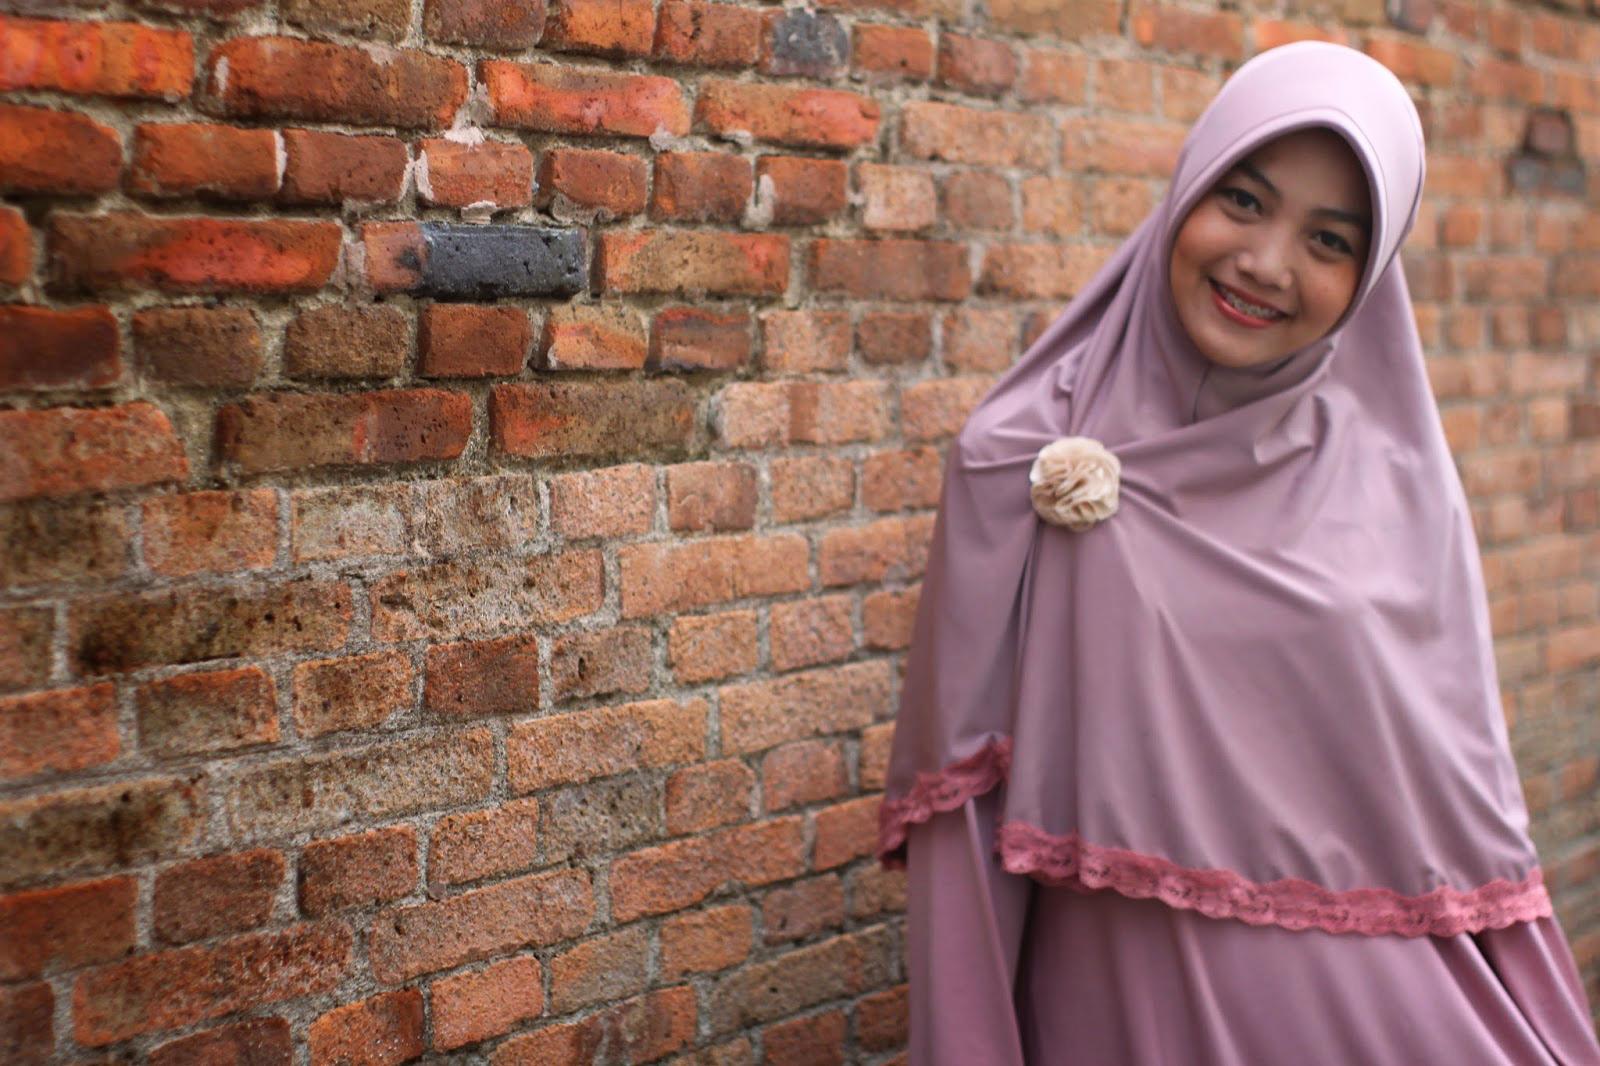 7 gaya hijab Cewek IGO Efrida Yanti yang suka pakai jeans 7 wanita hijab Cewek IGO Efrida Yanti tercantik